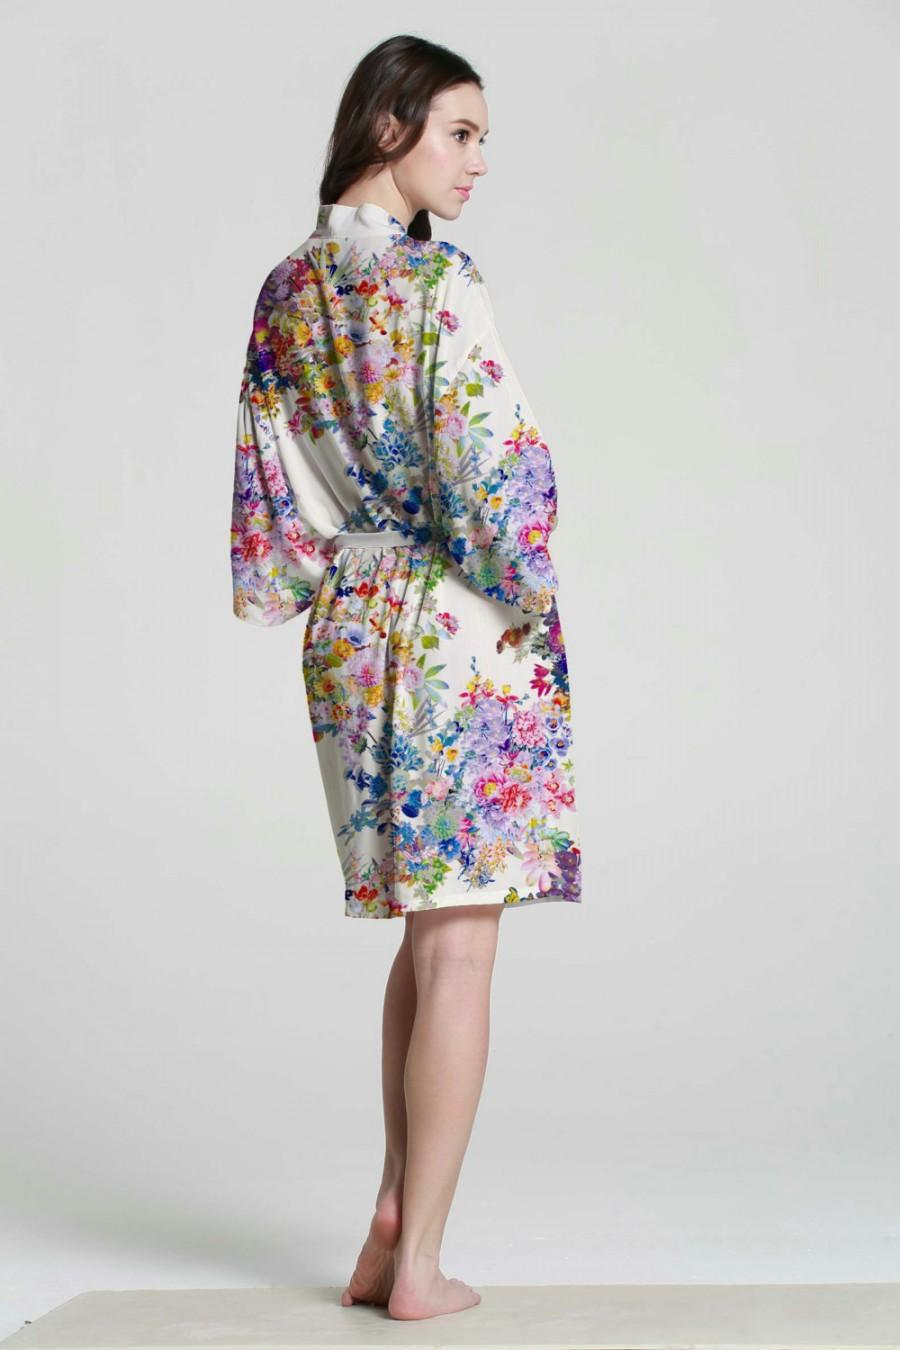 I03308 Bridesmaid Personalized Robes Cotton Kimono Robe Monogrammed ...